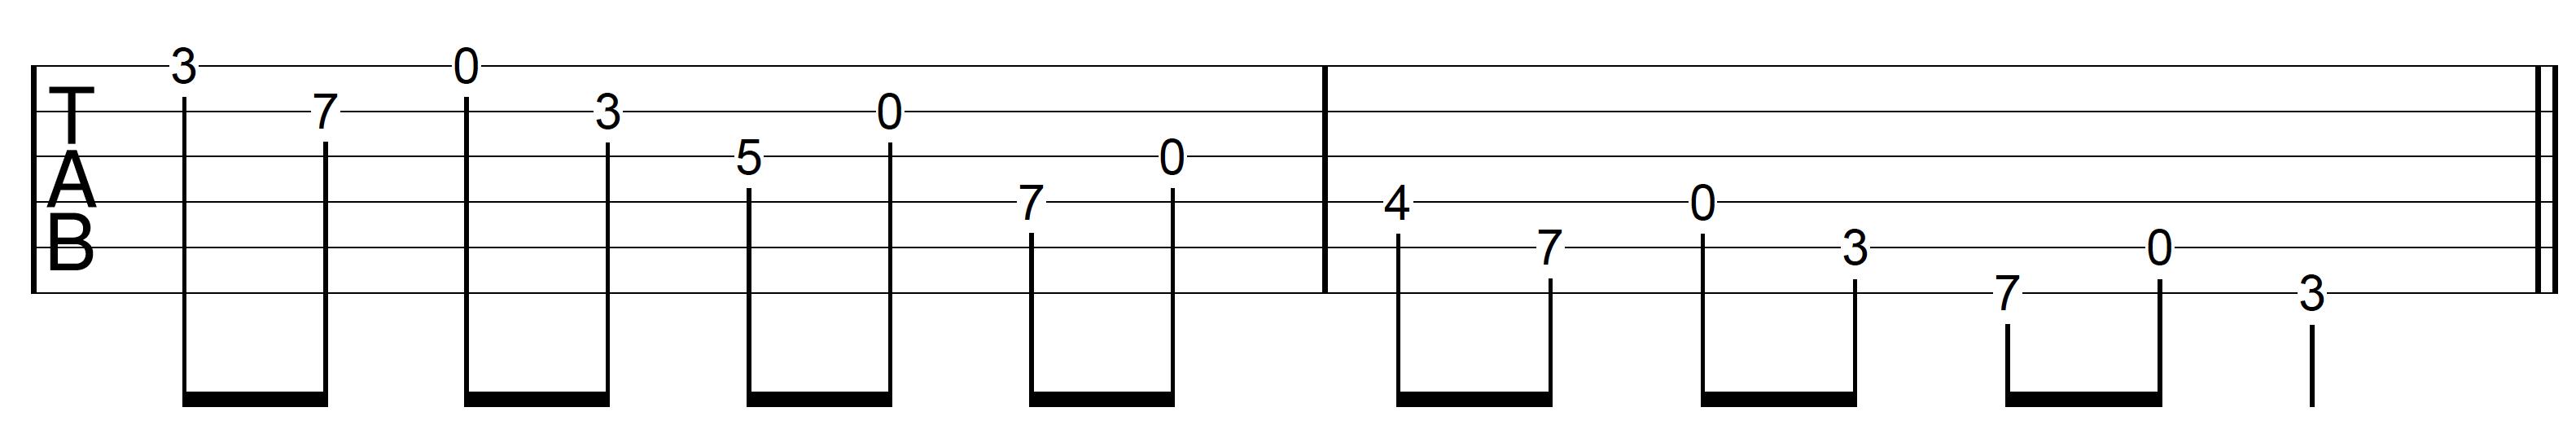 Open String Scale G Major 1 Descend Open